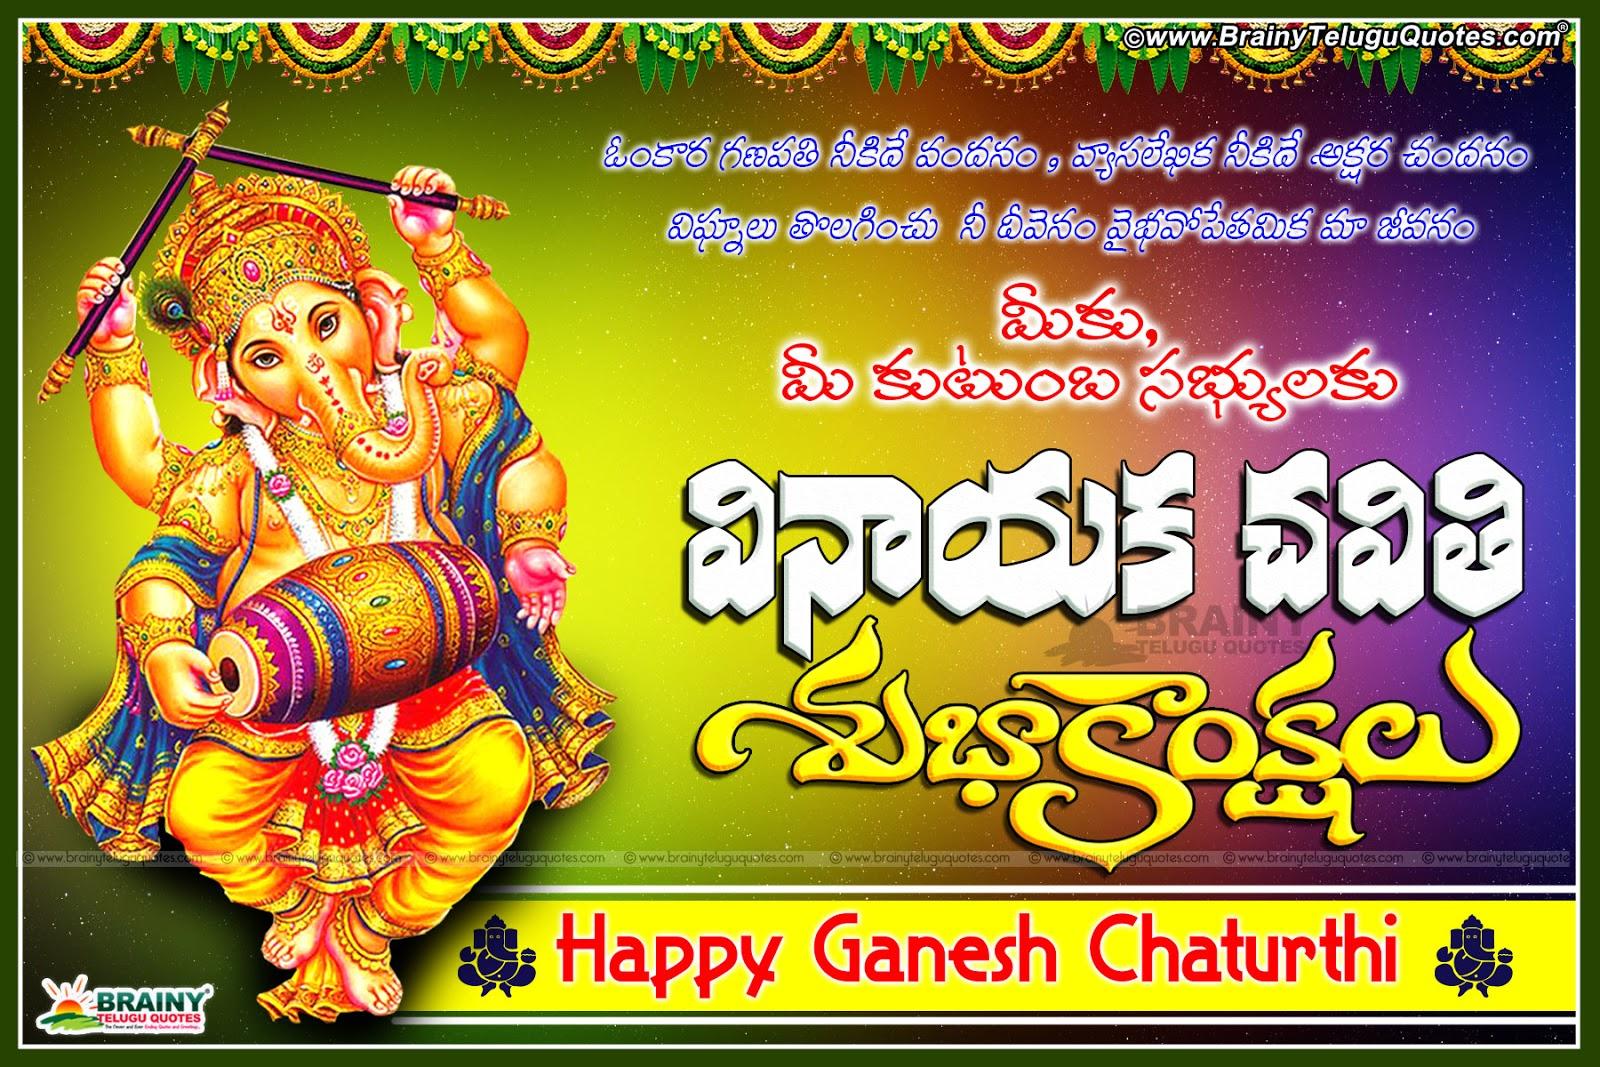 Vinayaka chavithi hd images alpha beta demo here is vinayaka chavithi telugu quotes and greetings with god ganesh prayers slokams images vinayaka m4hsunfo Gallery